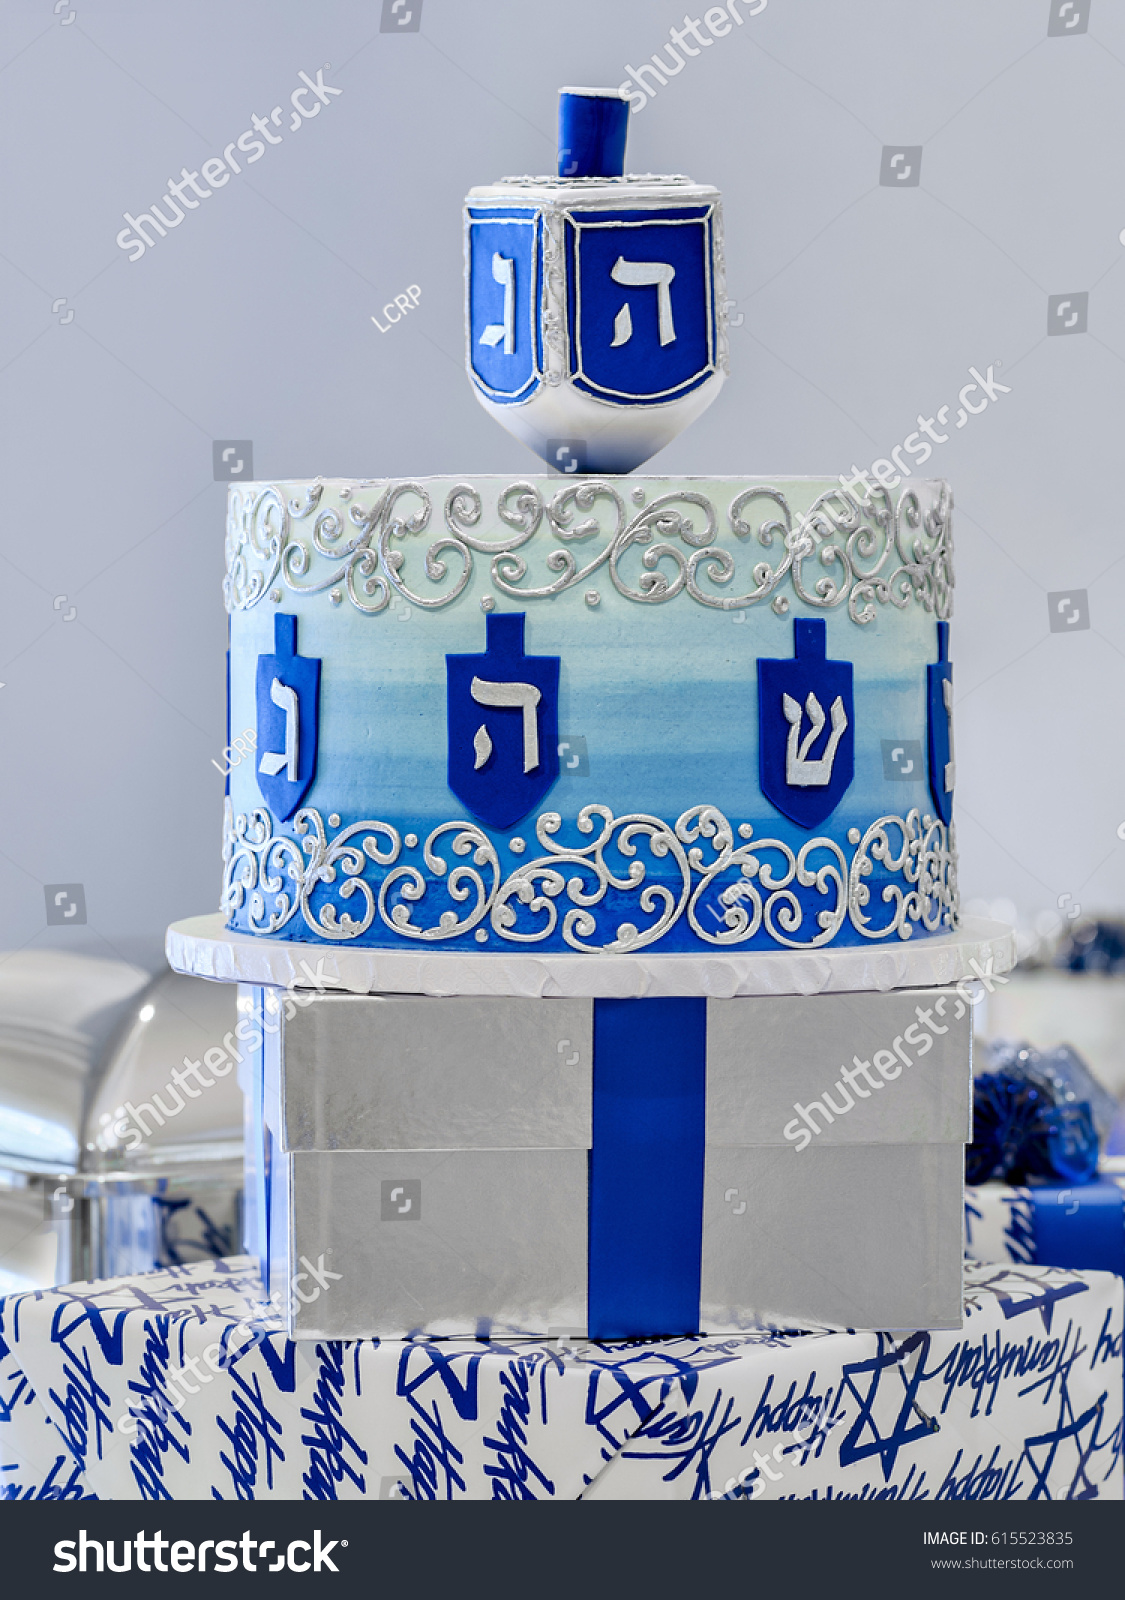 Bright Festive Chanukah Hanukkah Cake Centrepiece Stock Photo 100